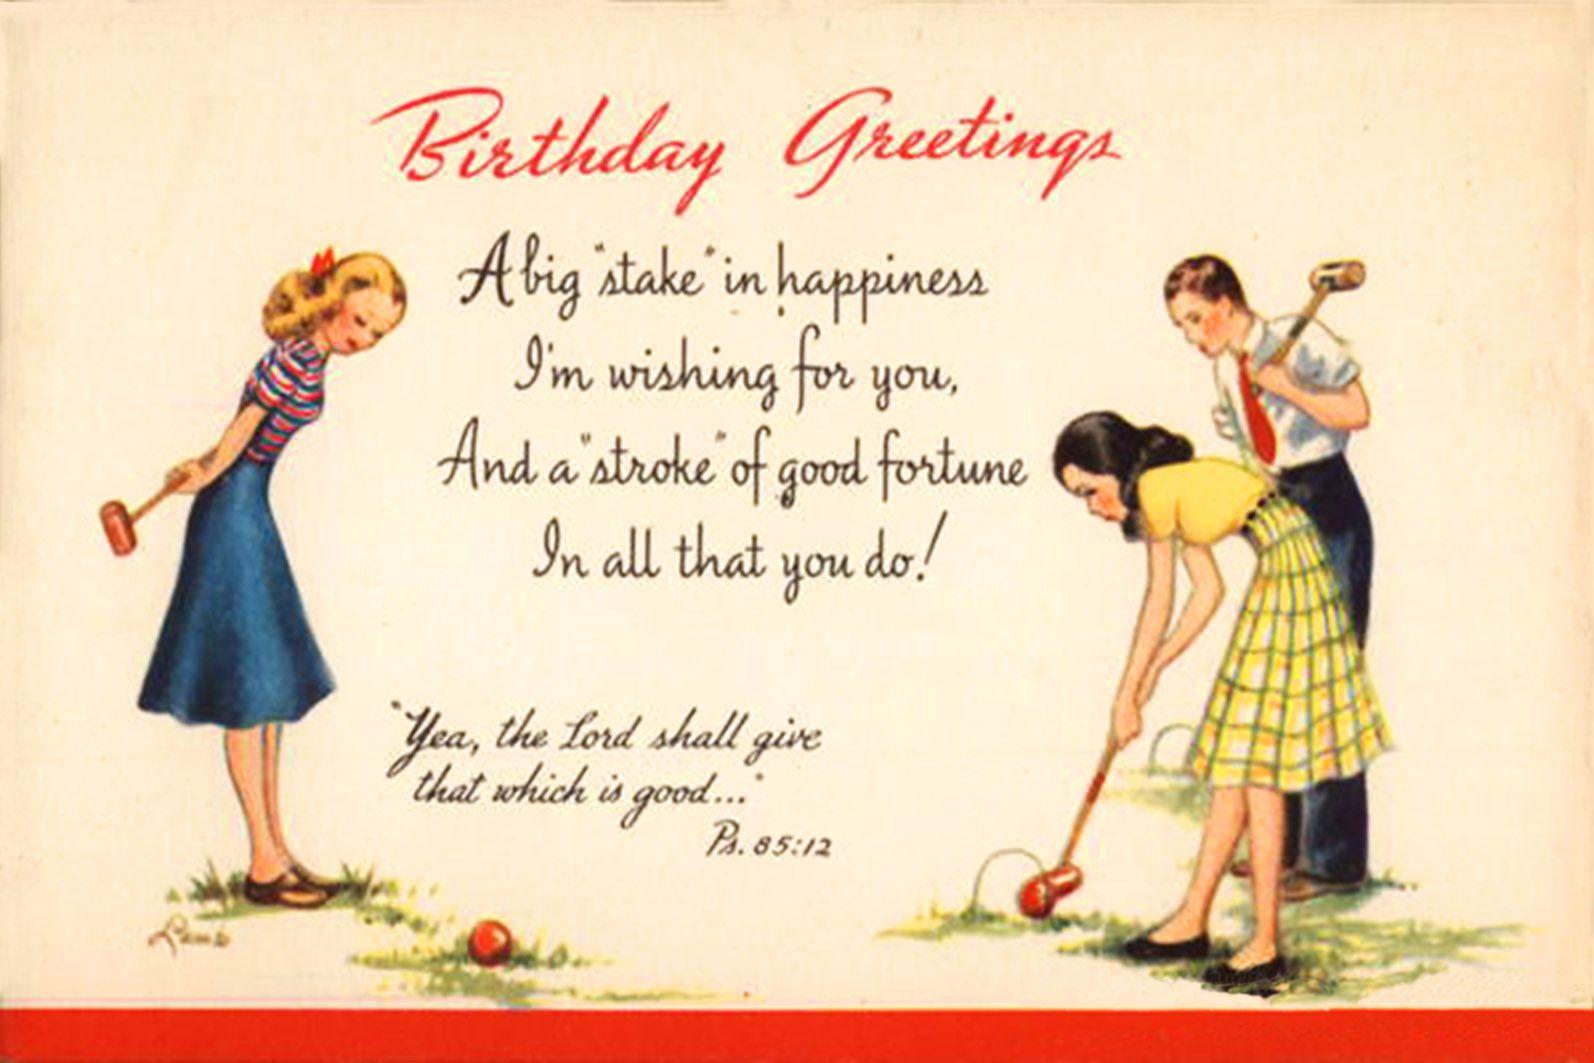 Birthday Greeting Cards Printable Birthday Cards Free Printable Greet Happy Birthday Cards Printable Birthday Card Printable Funny Printable Birthday Cards